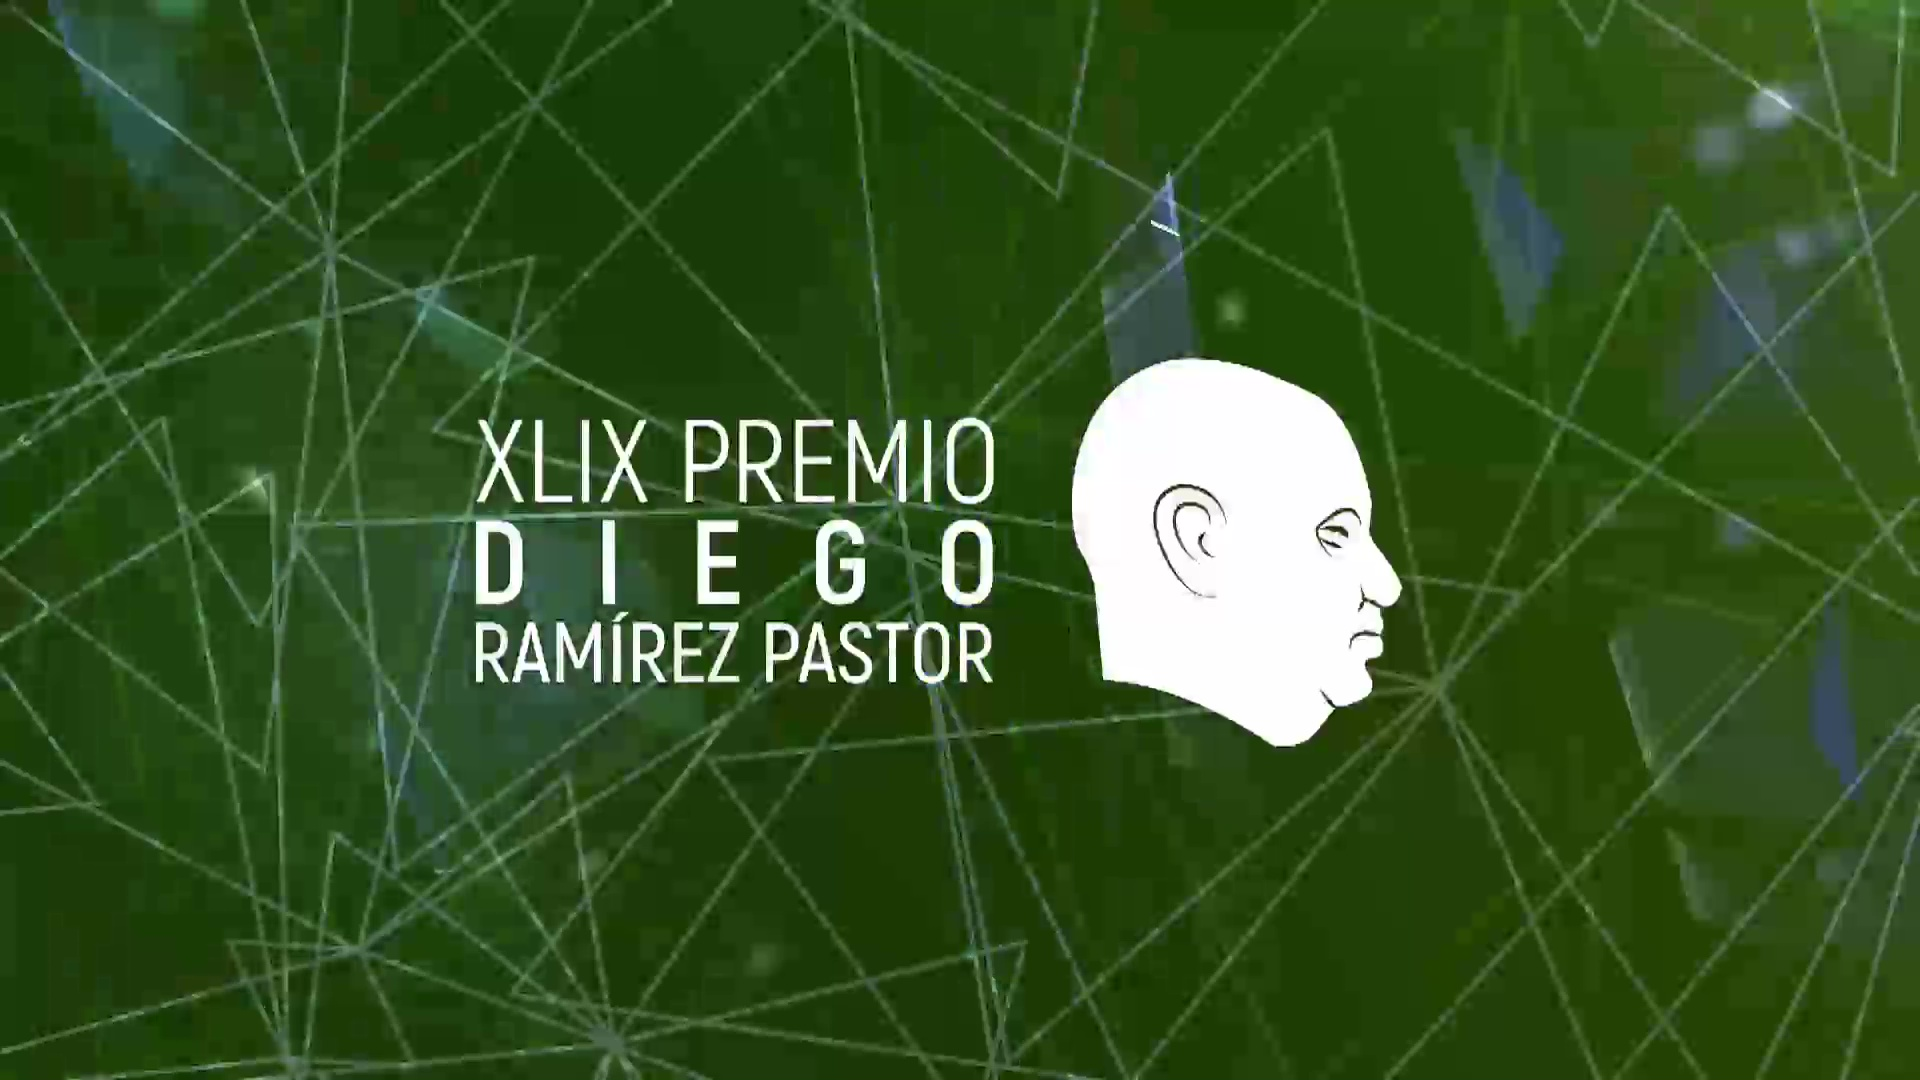 Fallo Jurado XLIX Diego Ramirez Pastor